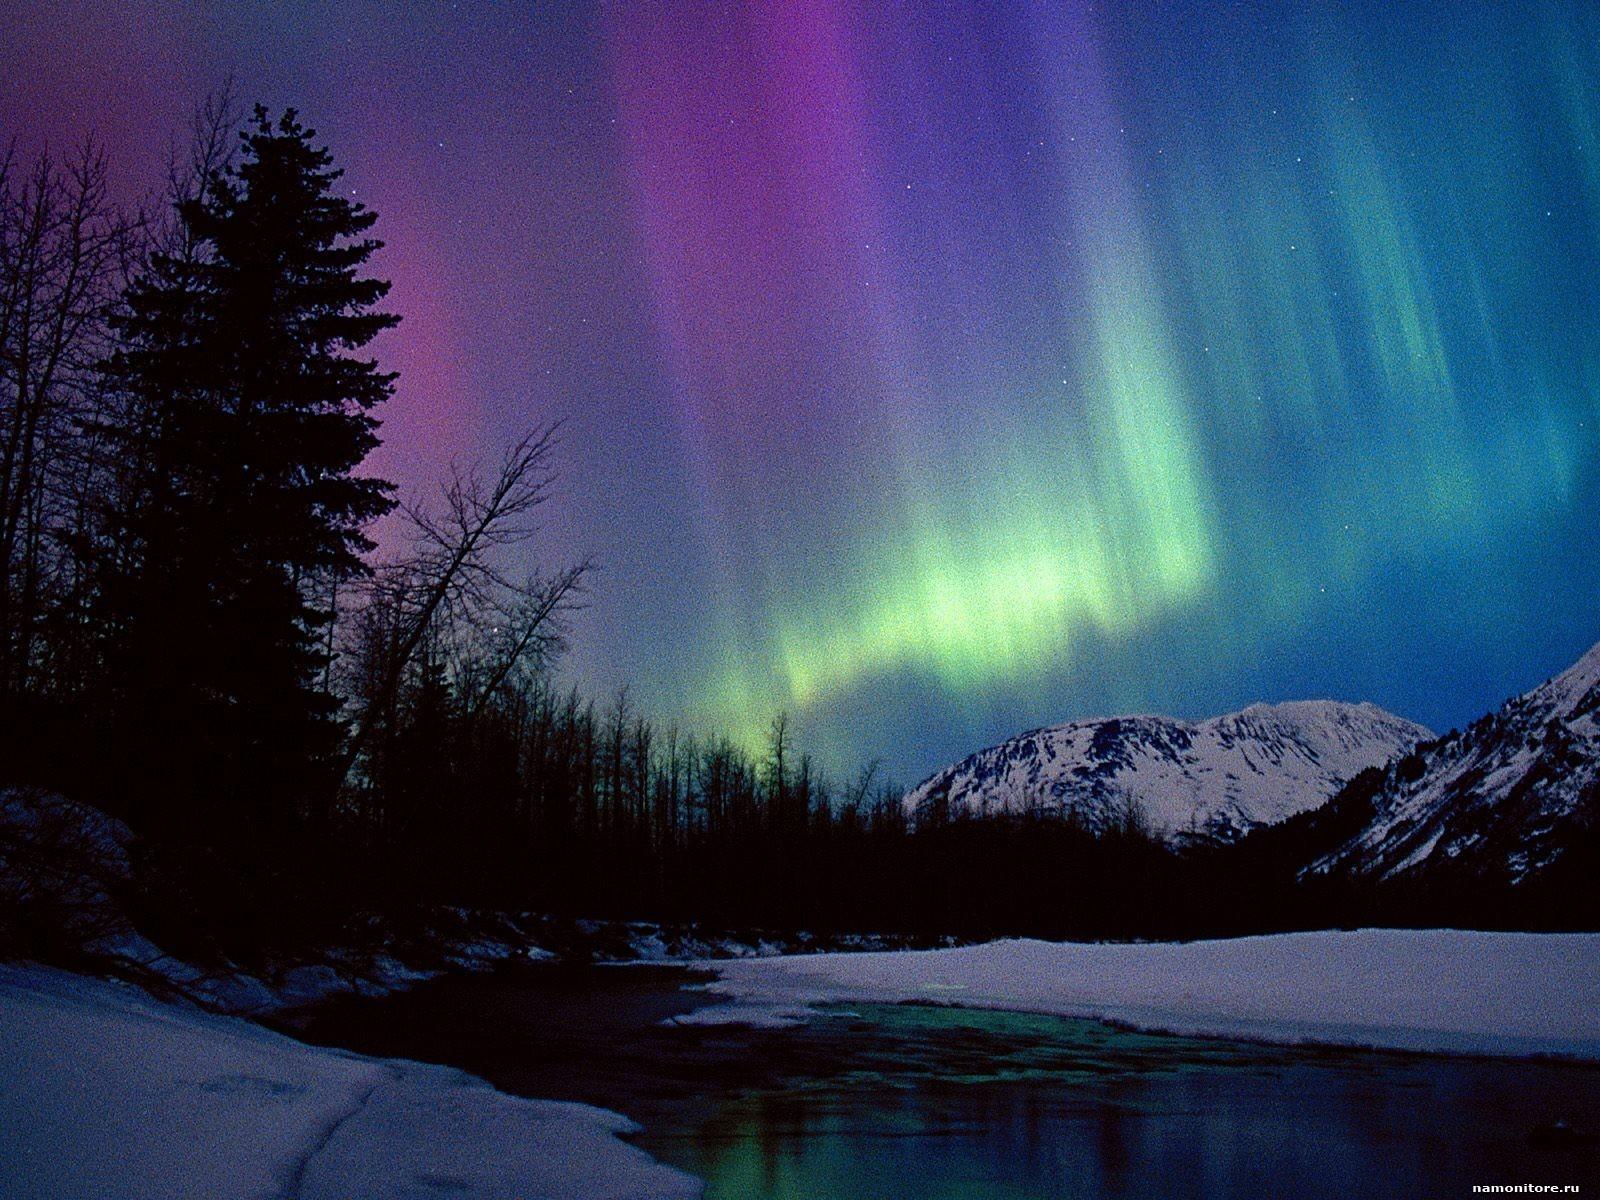 The Polar lights over hills, nature, night, winter 1600x1200